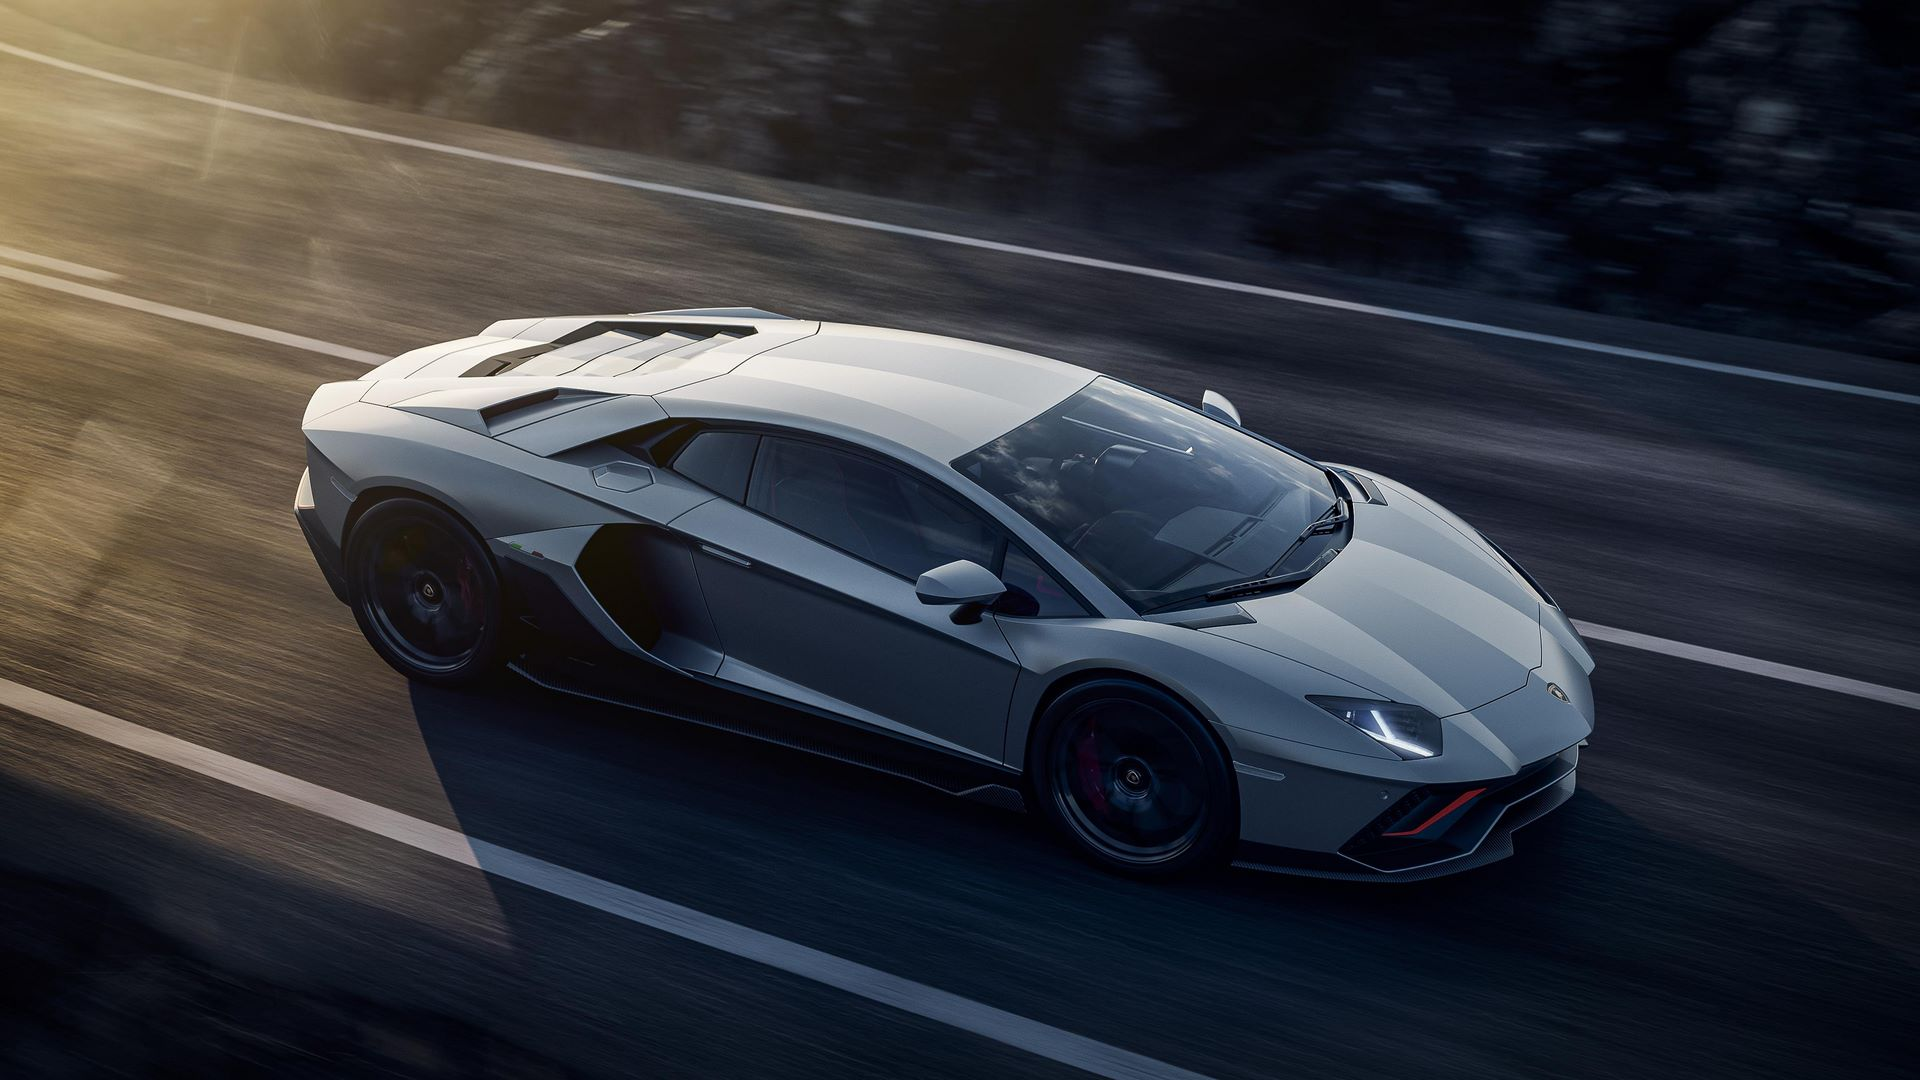 Lamborghini-Aventador-LP780-4-Ultimae-45